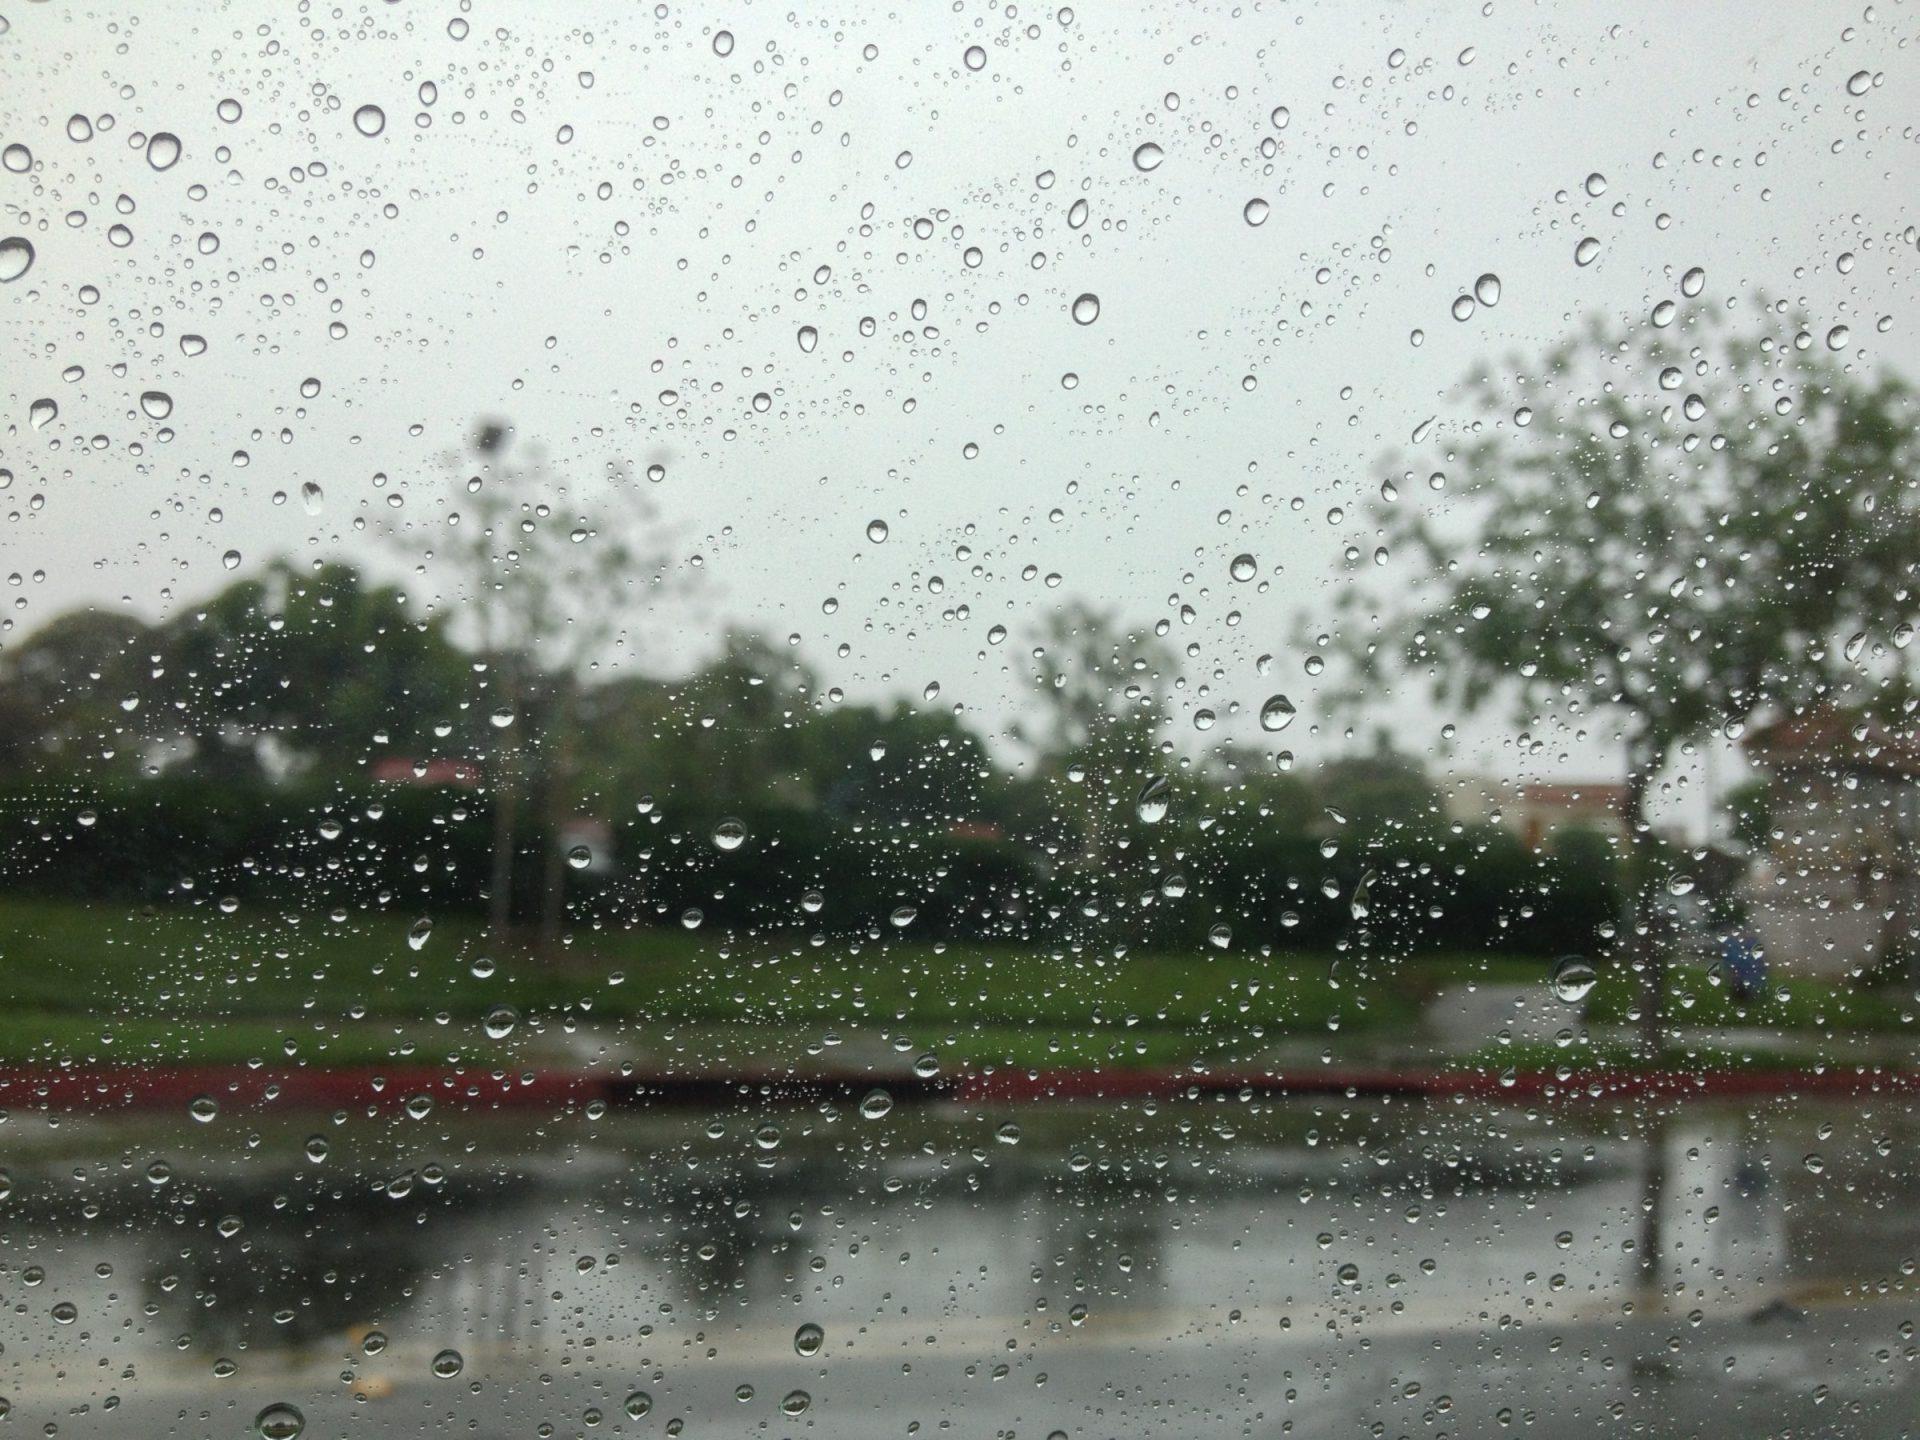 Raindrops on Window Looking at Street